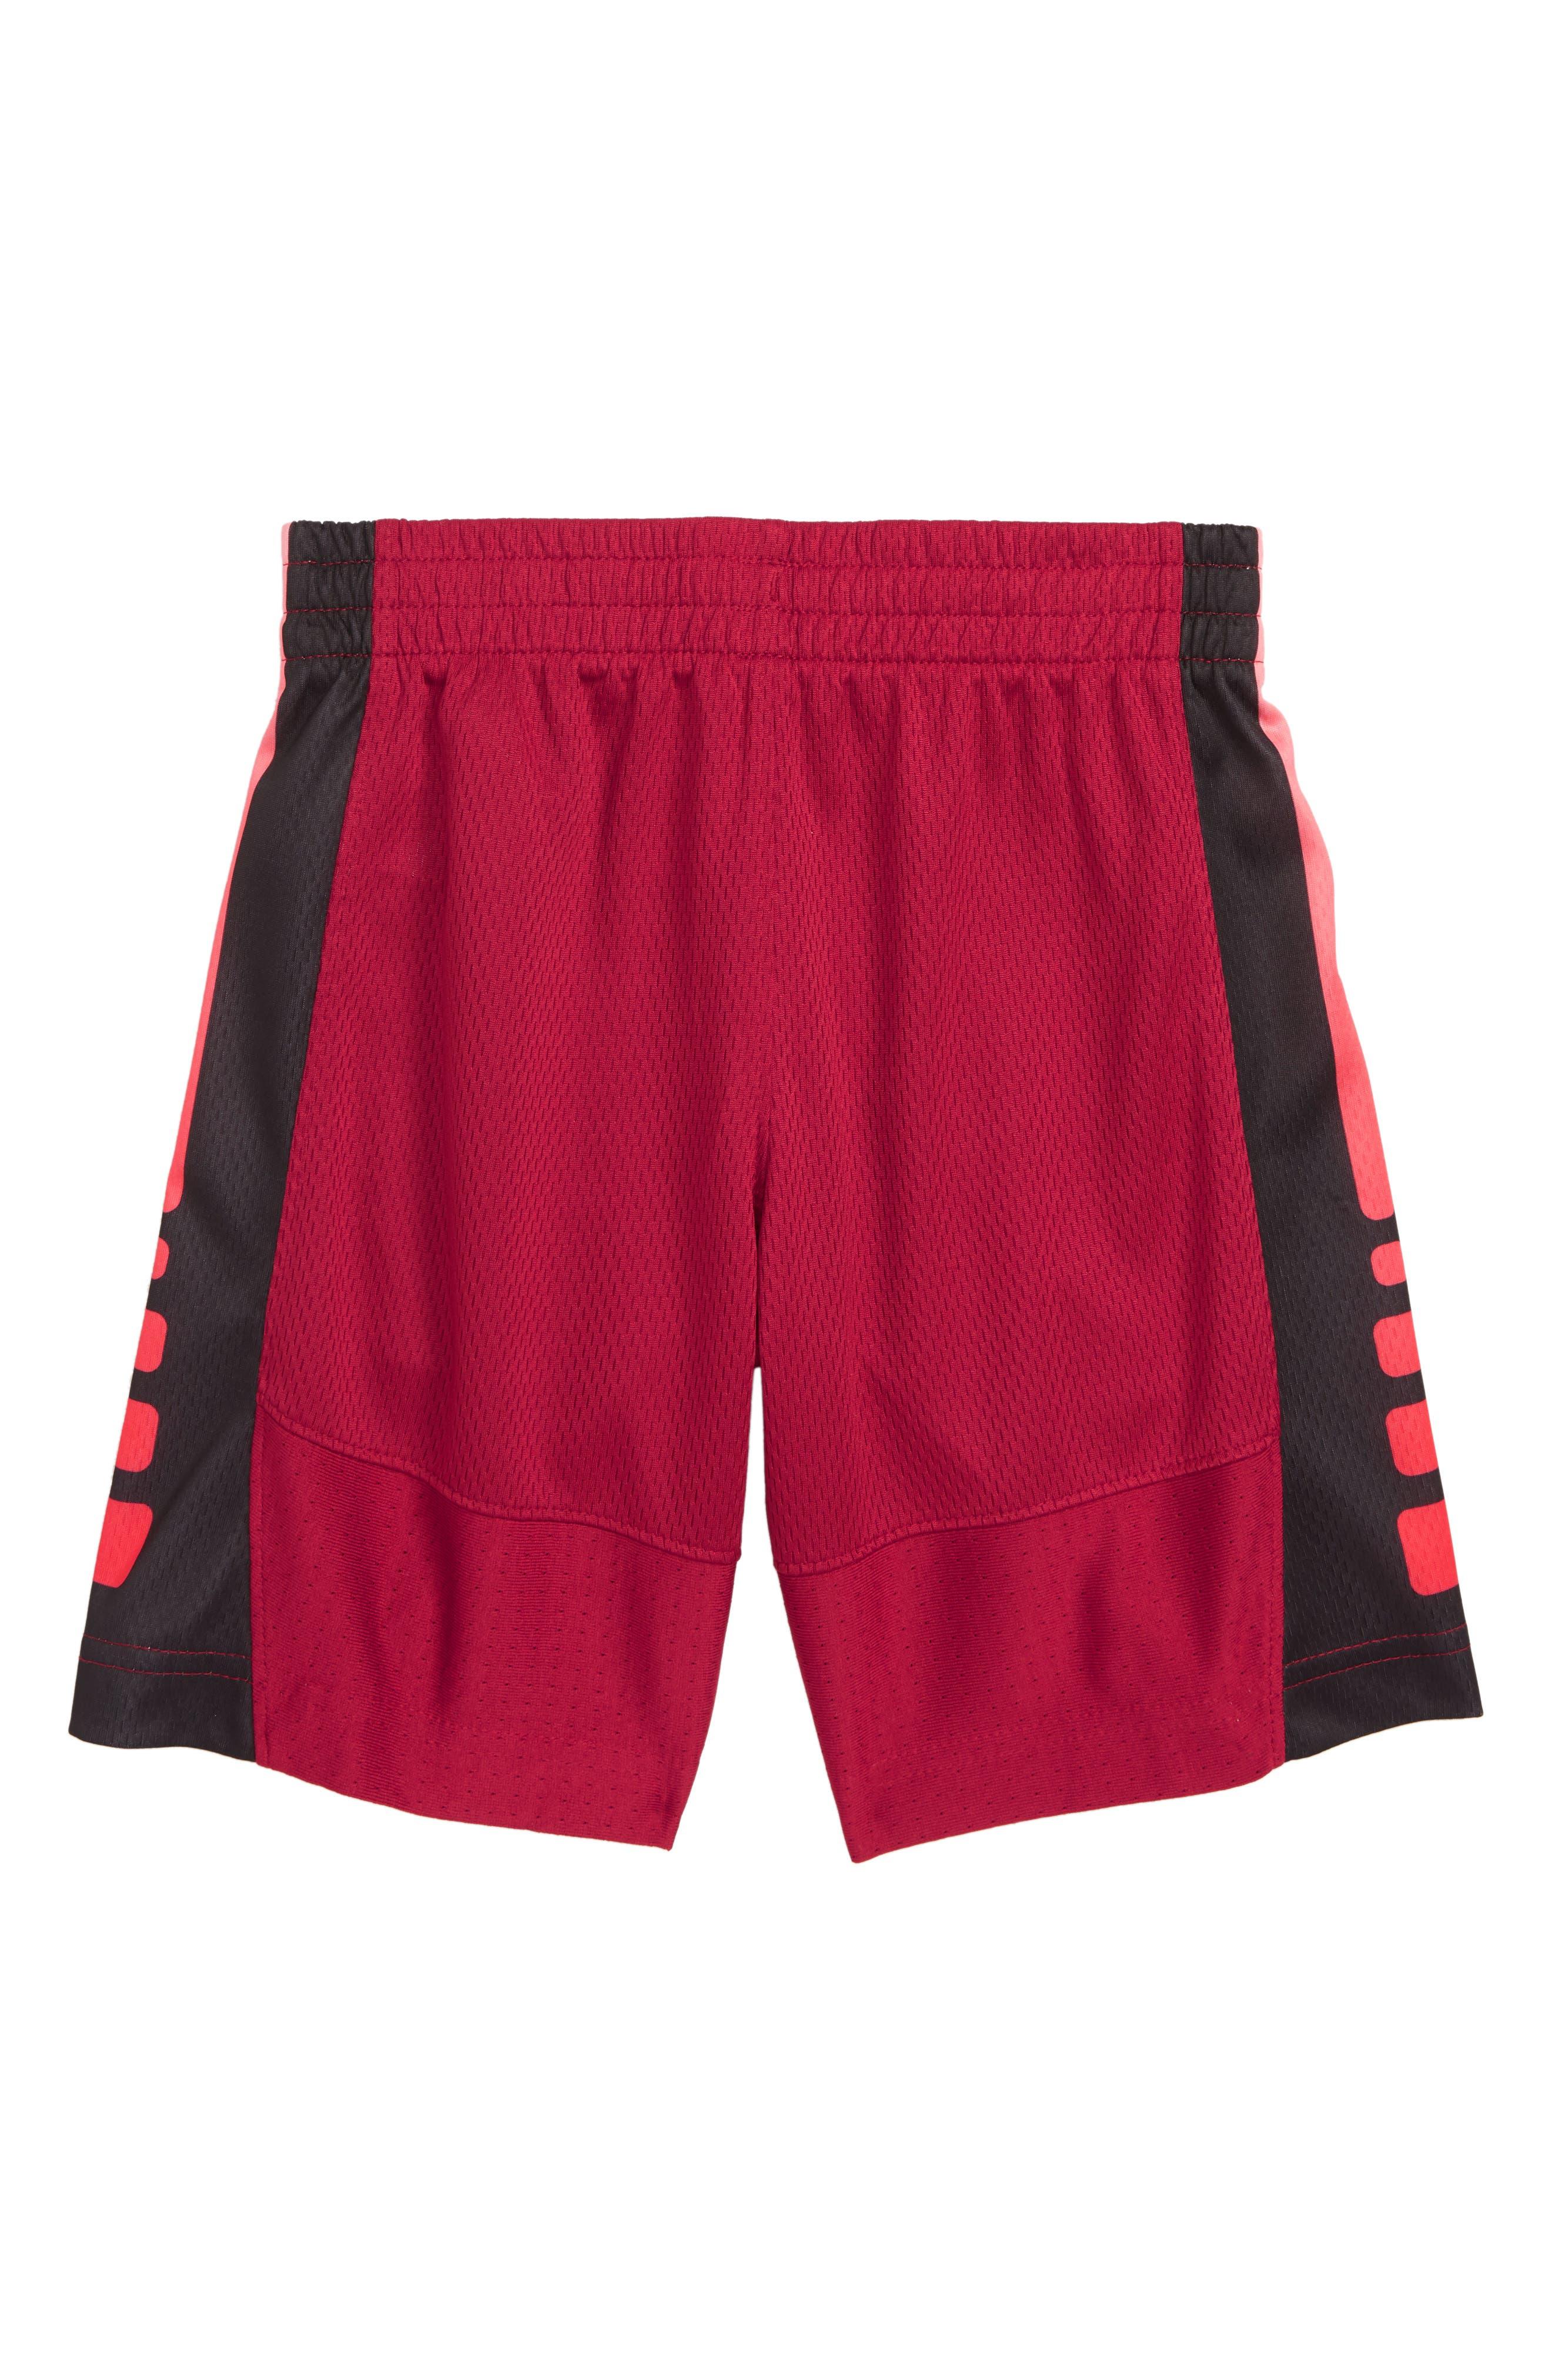 Elite Stripe Shorts,                             Alternate thumbnail 2, color,                             RED CRUSH